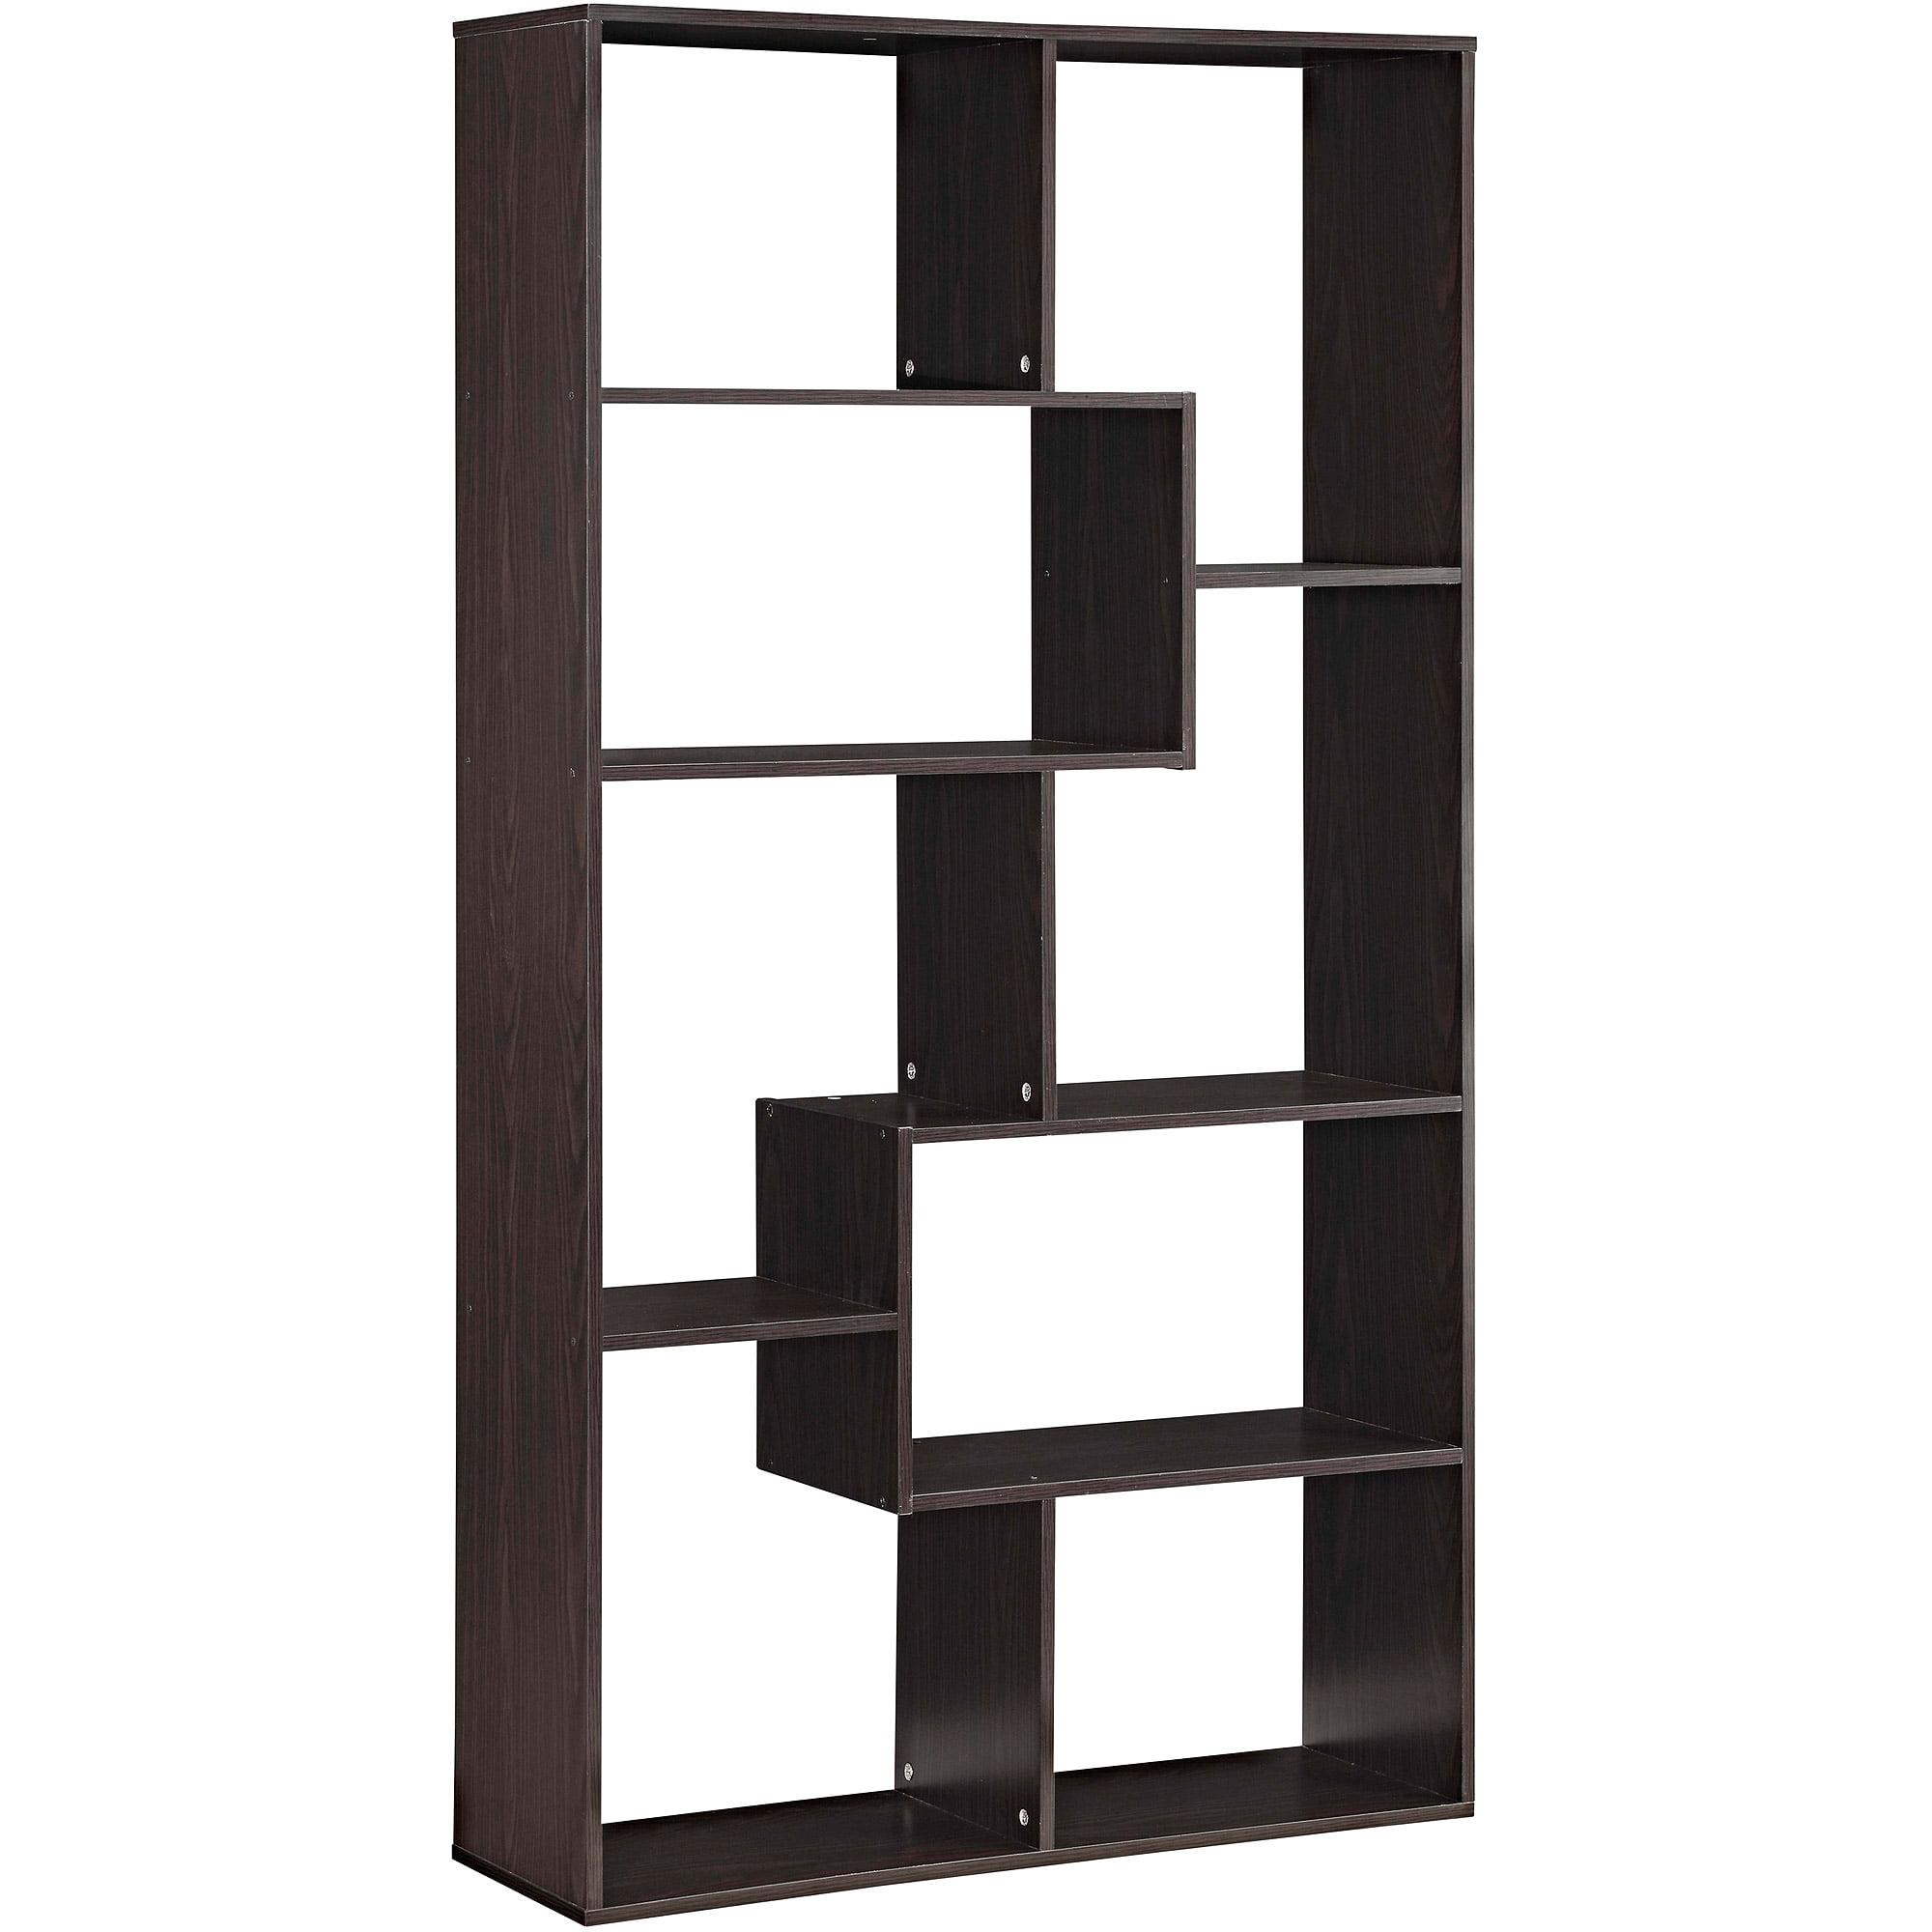 Mainstays Home 8-Shelf Bookcase